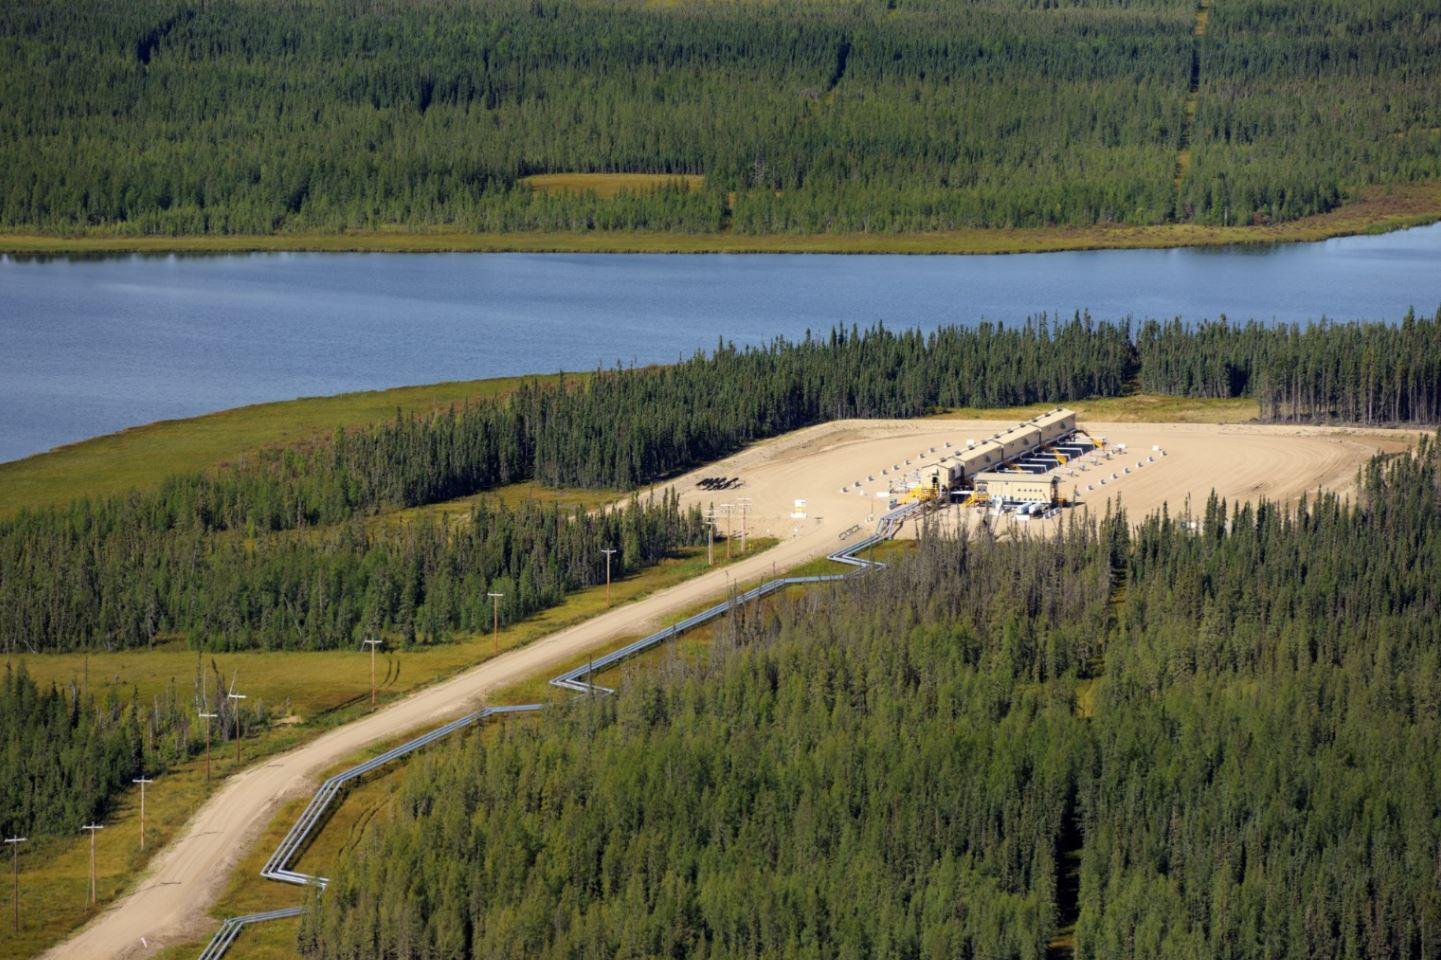 Cenovus SAGD - Oil Sands Pathways to Net-Zero Initiative